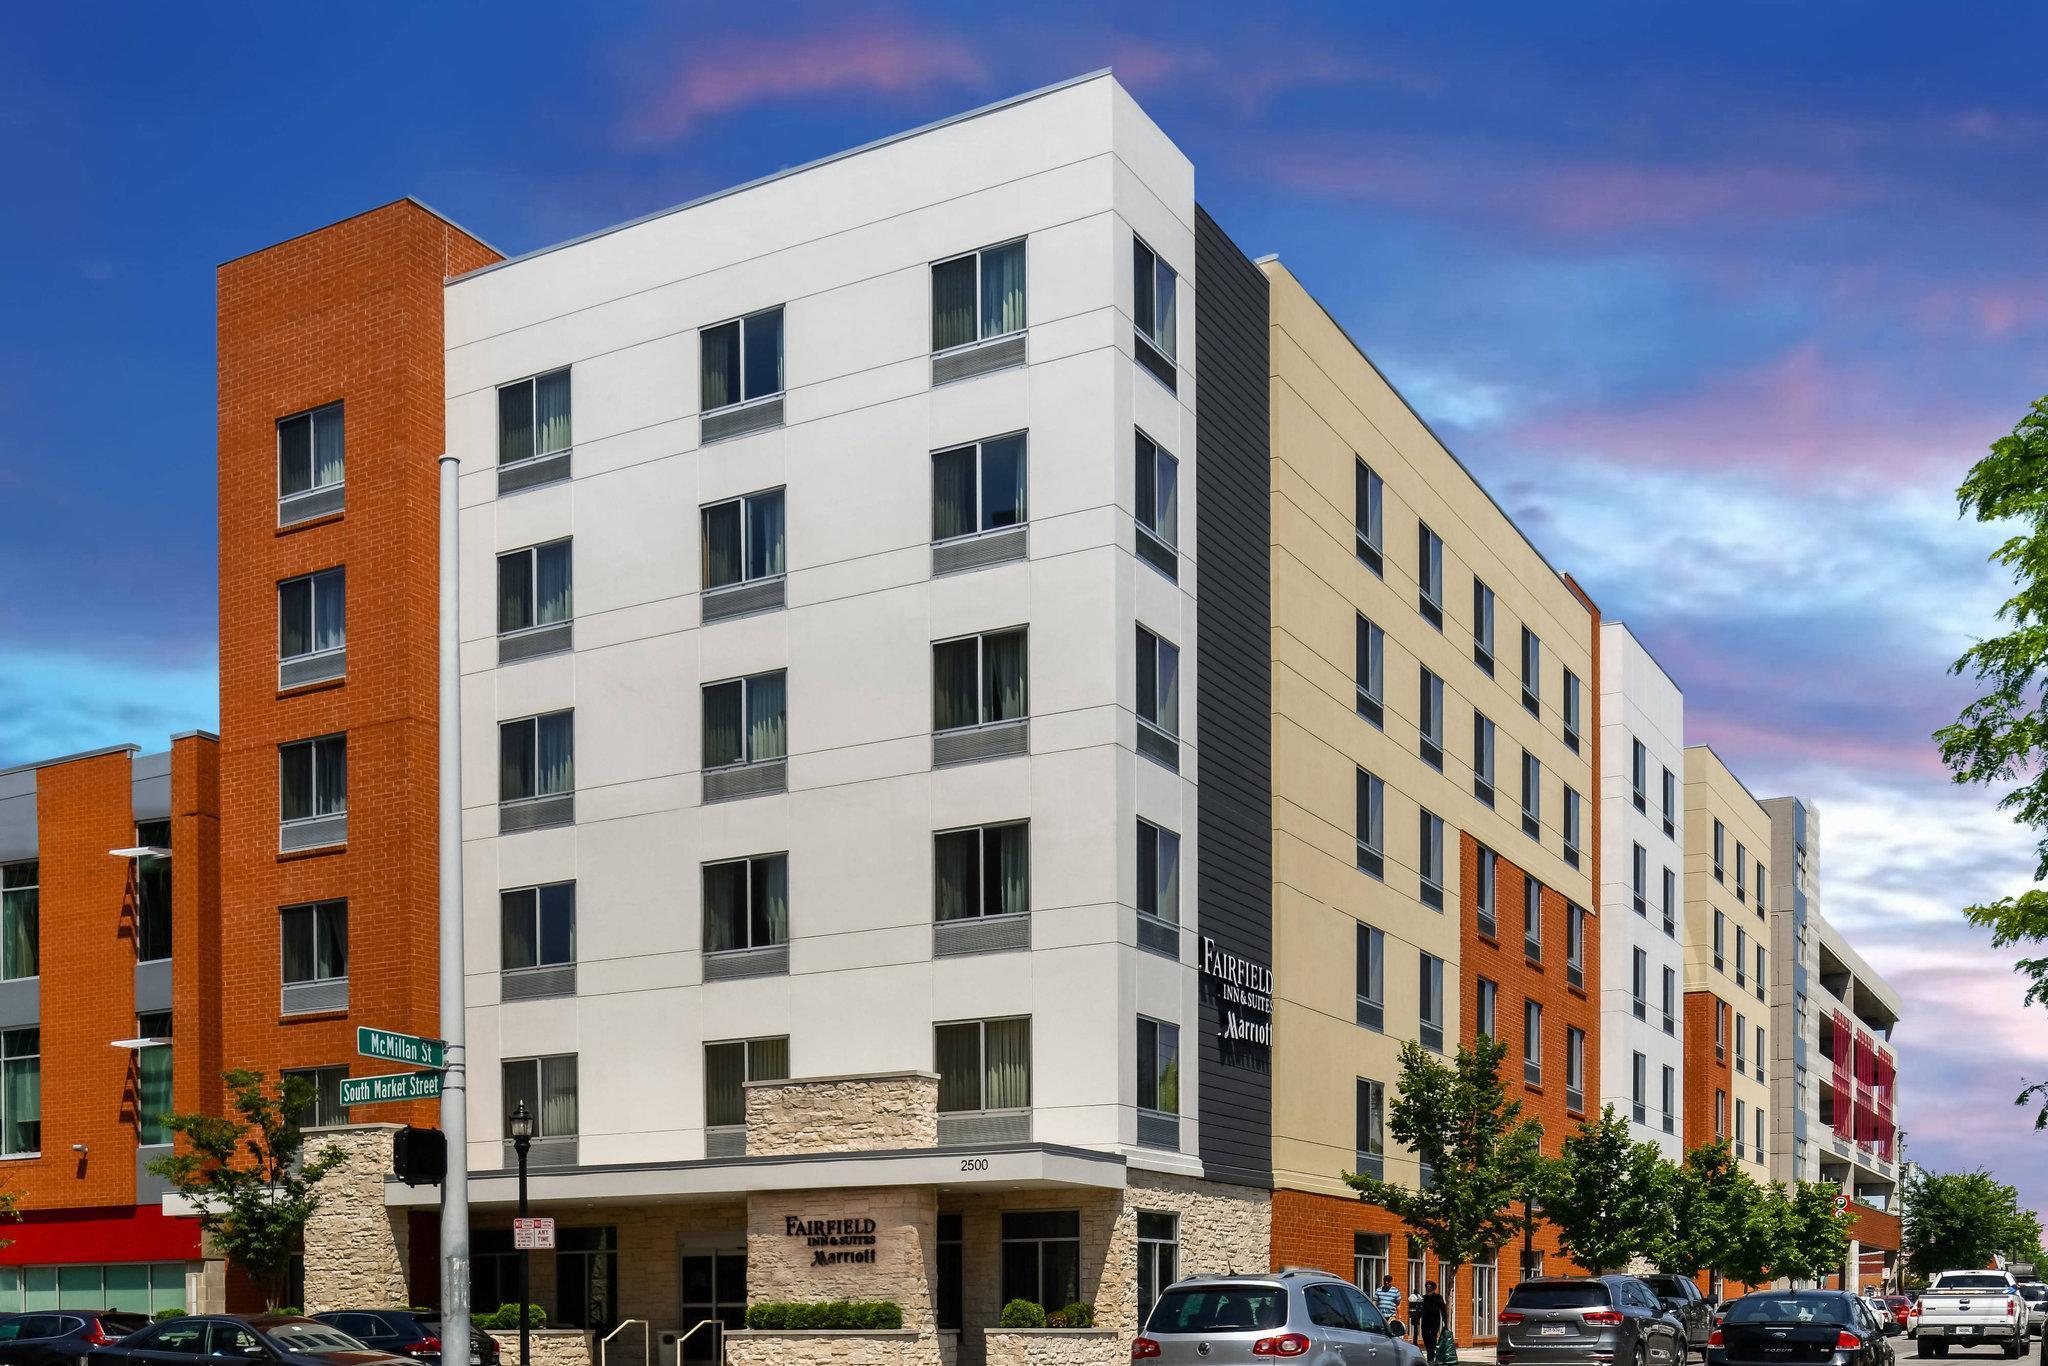 Fairfield Inn And Suites Cincinnati Uptown University Area